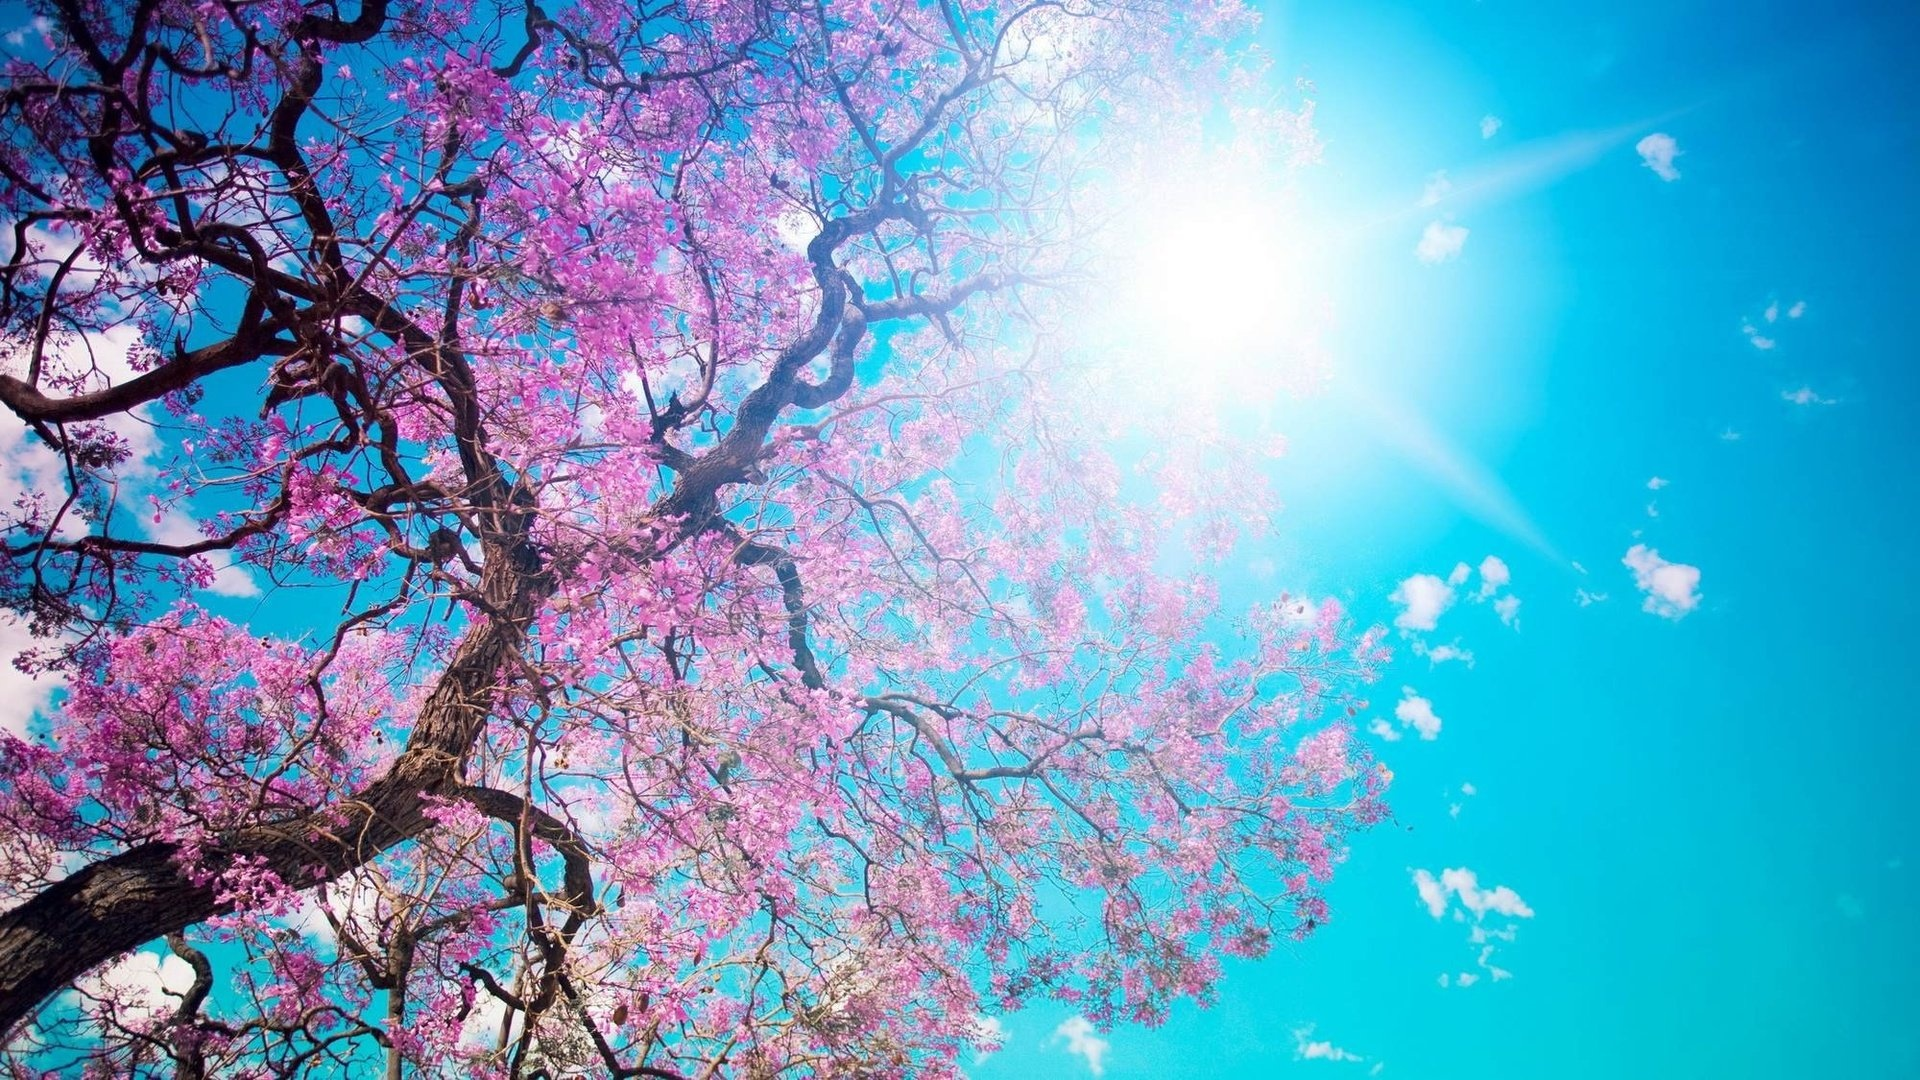 Springtime hd wallpaper 1080